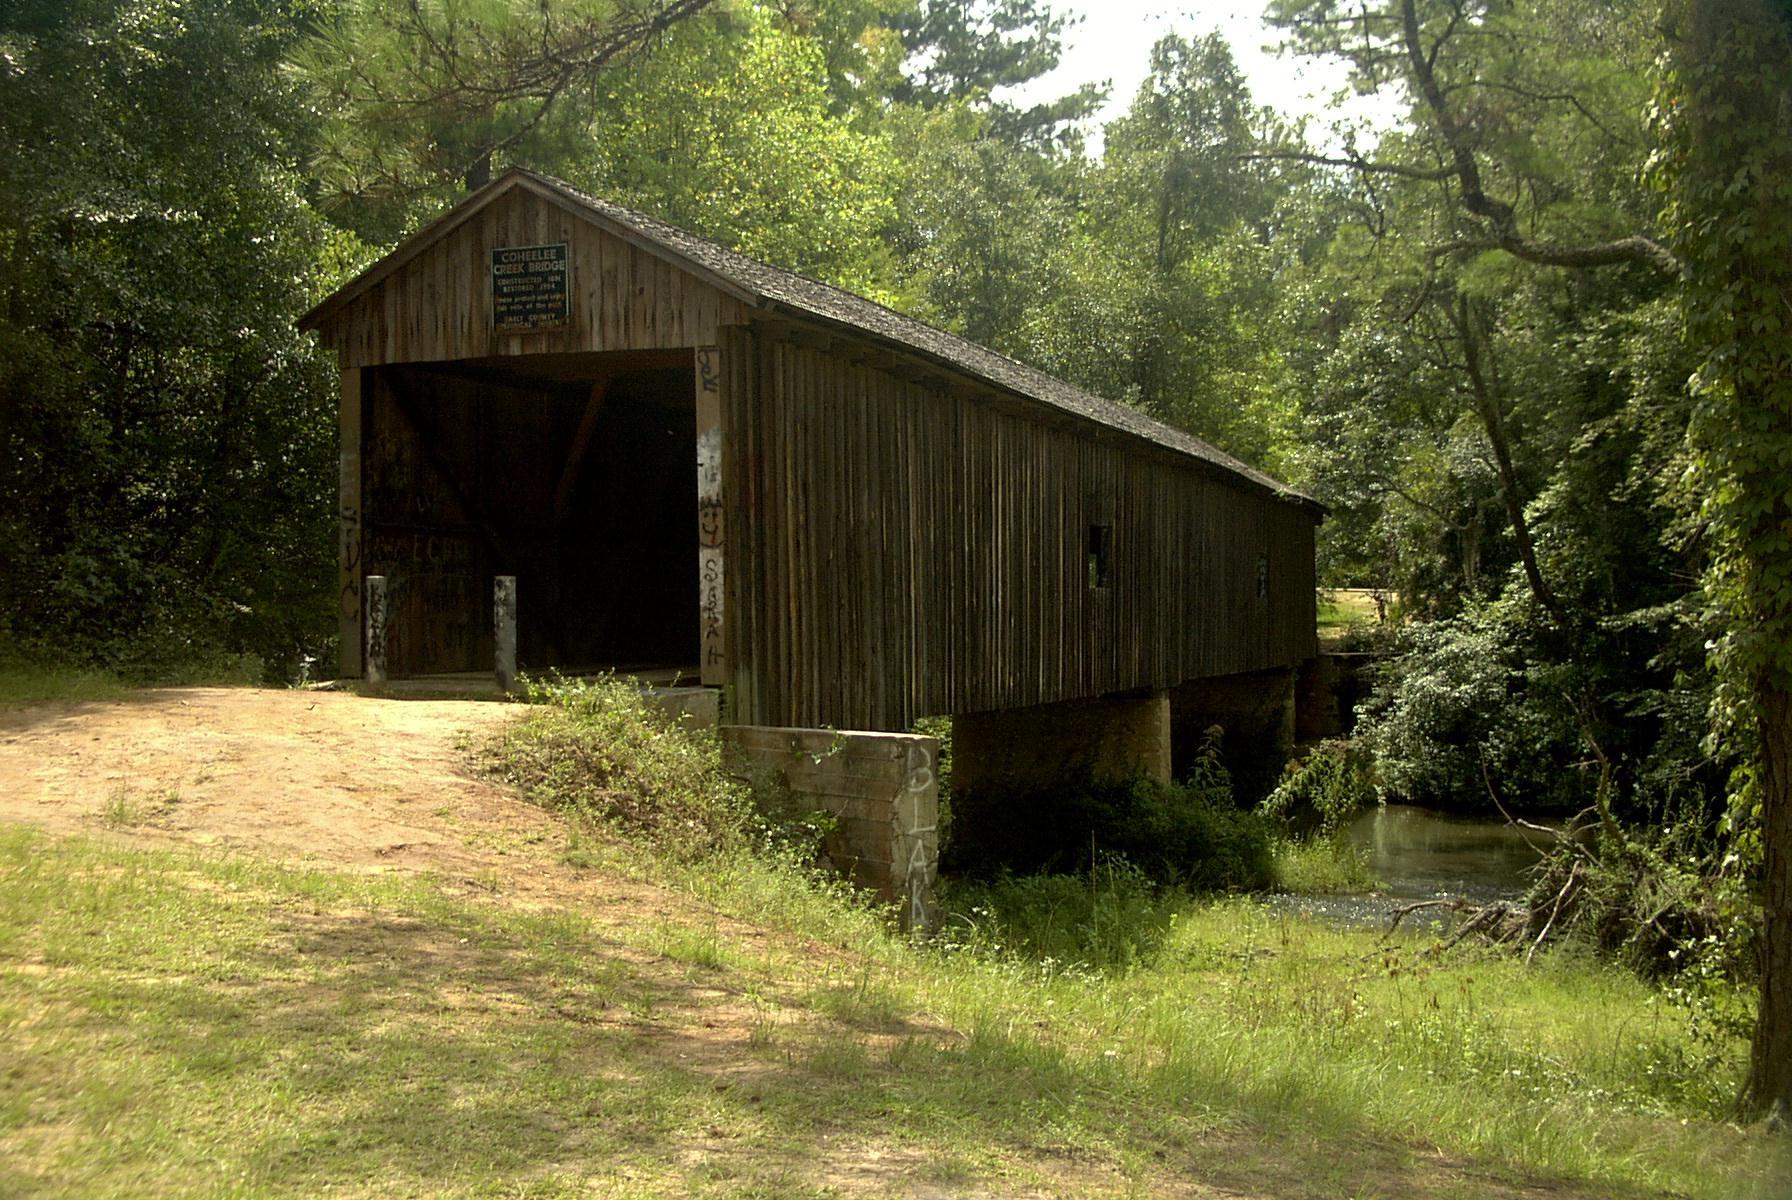 Shack, Tree, Nature reserve, Barn